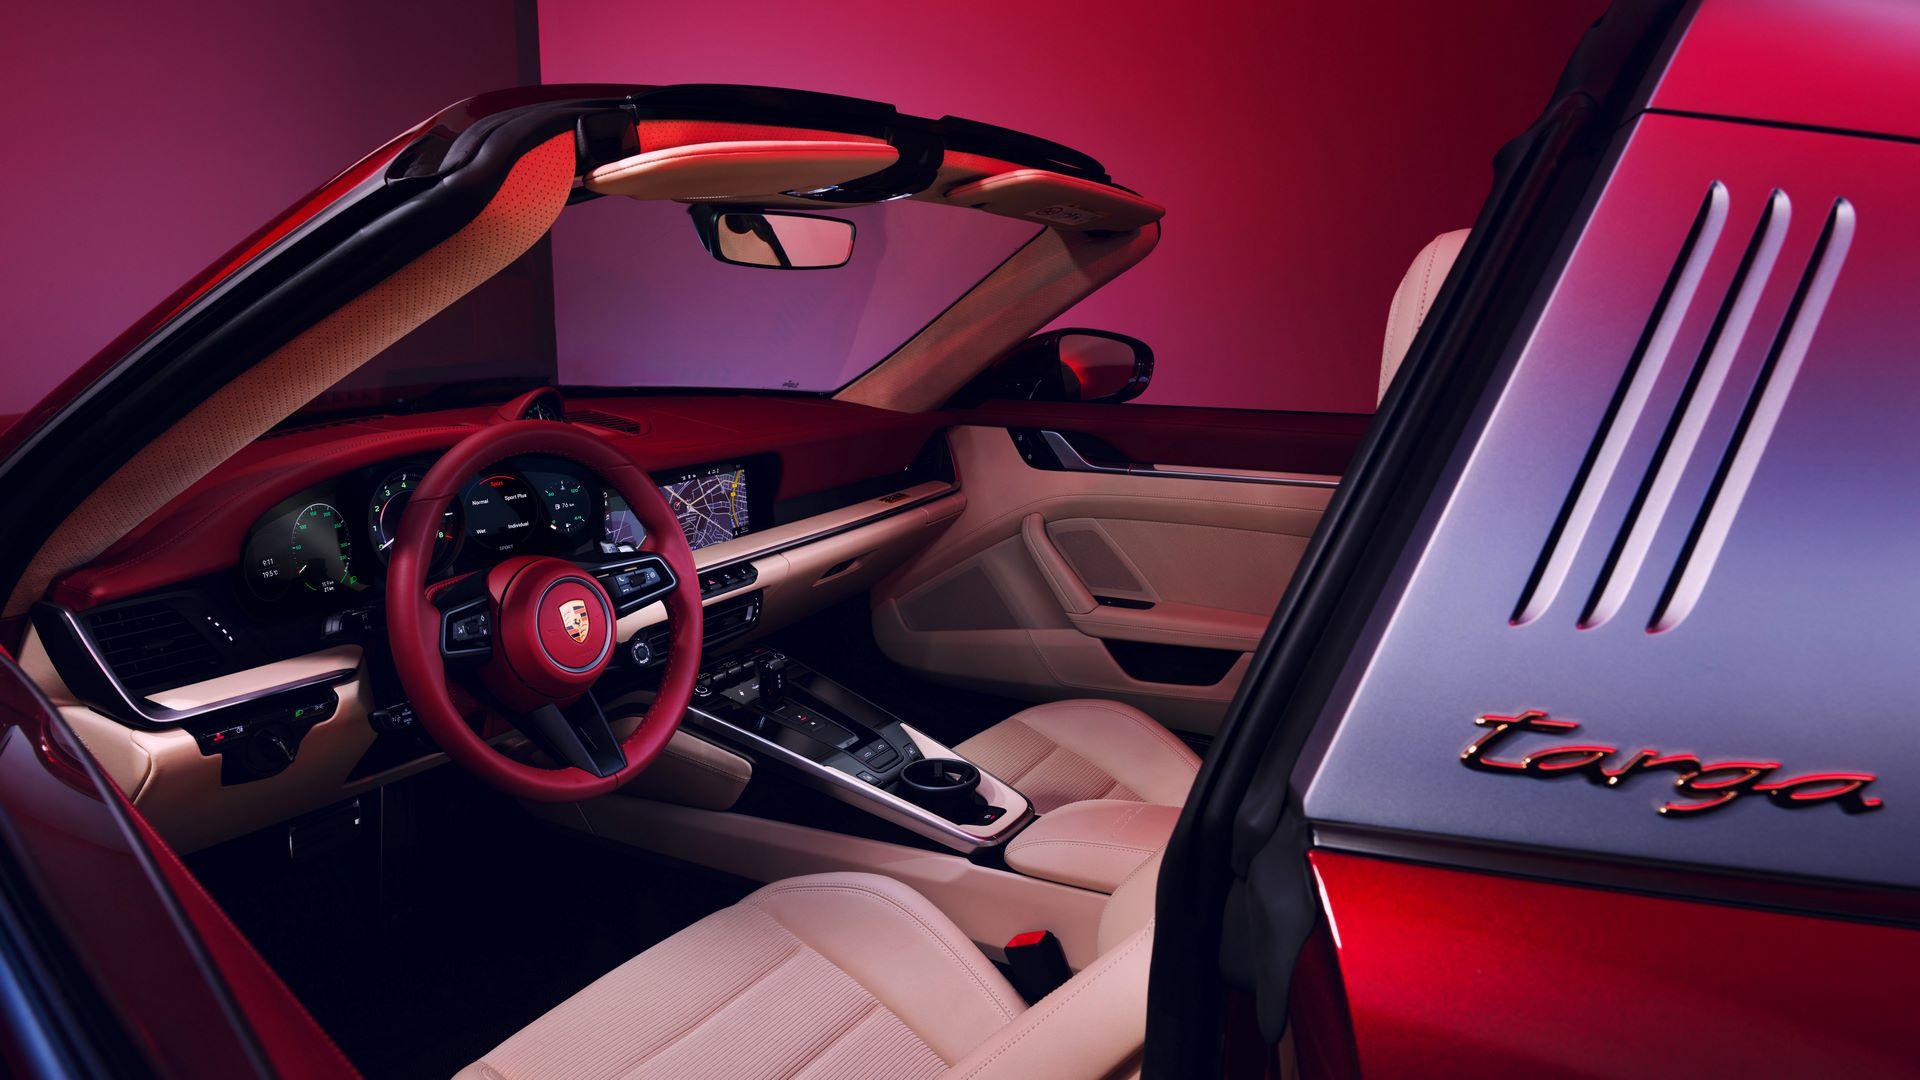 Porsche-911-Targa-4S-Heritage-Design-Edition-5